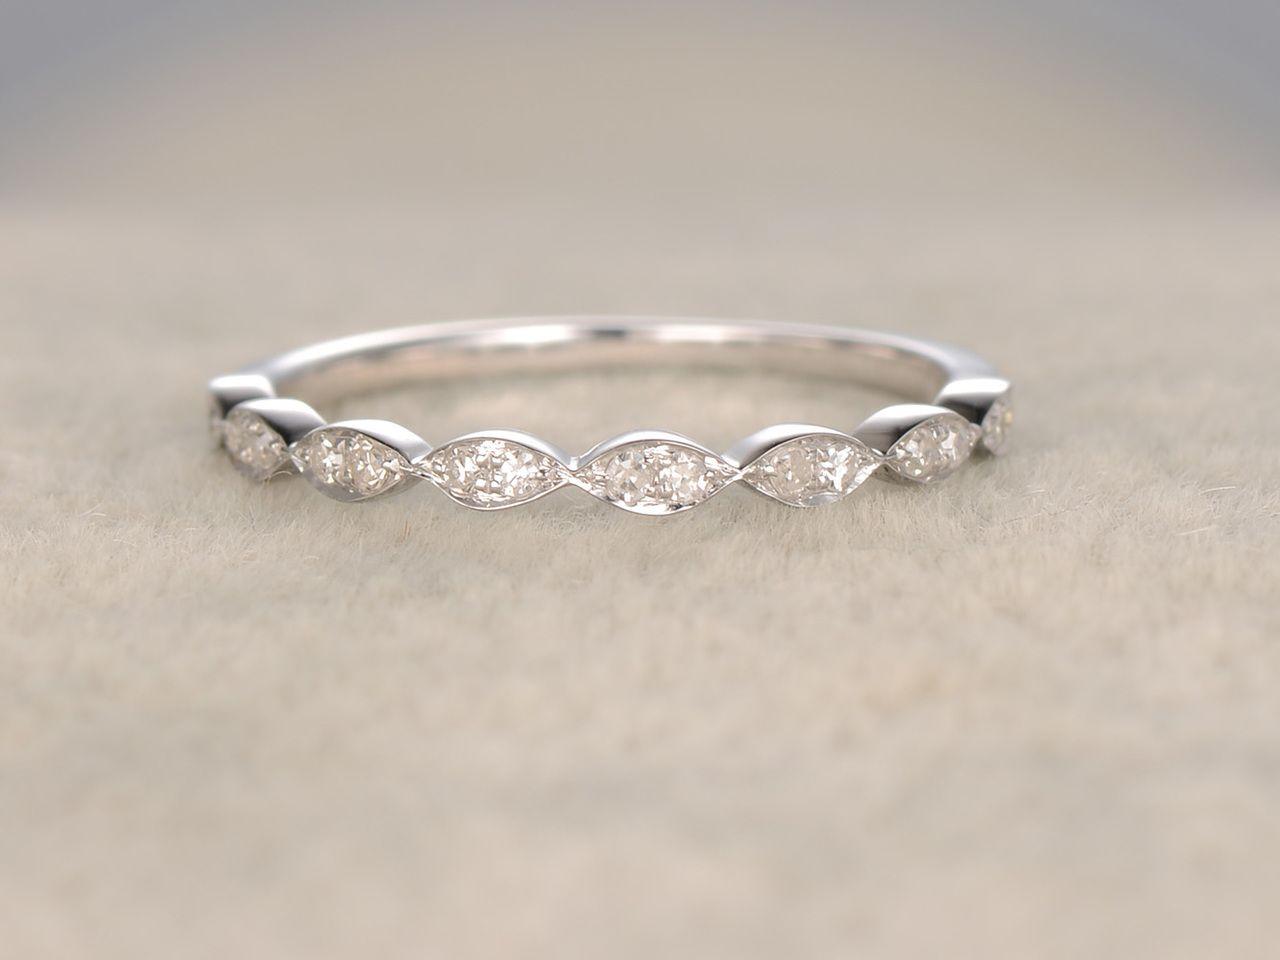 Diamond Wedding Rings For Her 14k White Gold Antique Art Deco Half Eternity Ba Diamond Wedding Bands Diamond Engagement Wedding Ring Pave Diamond Wedding Bands